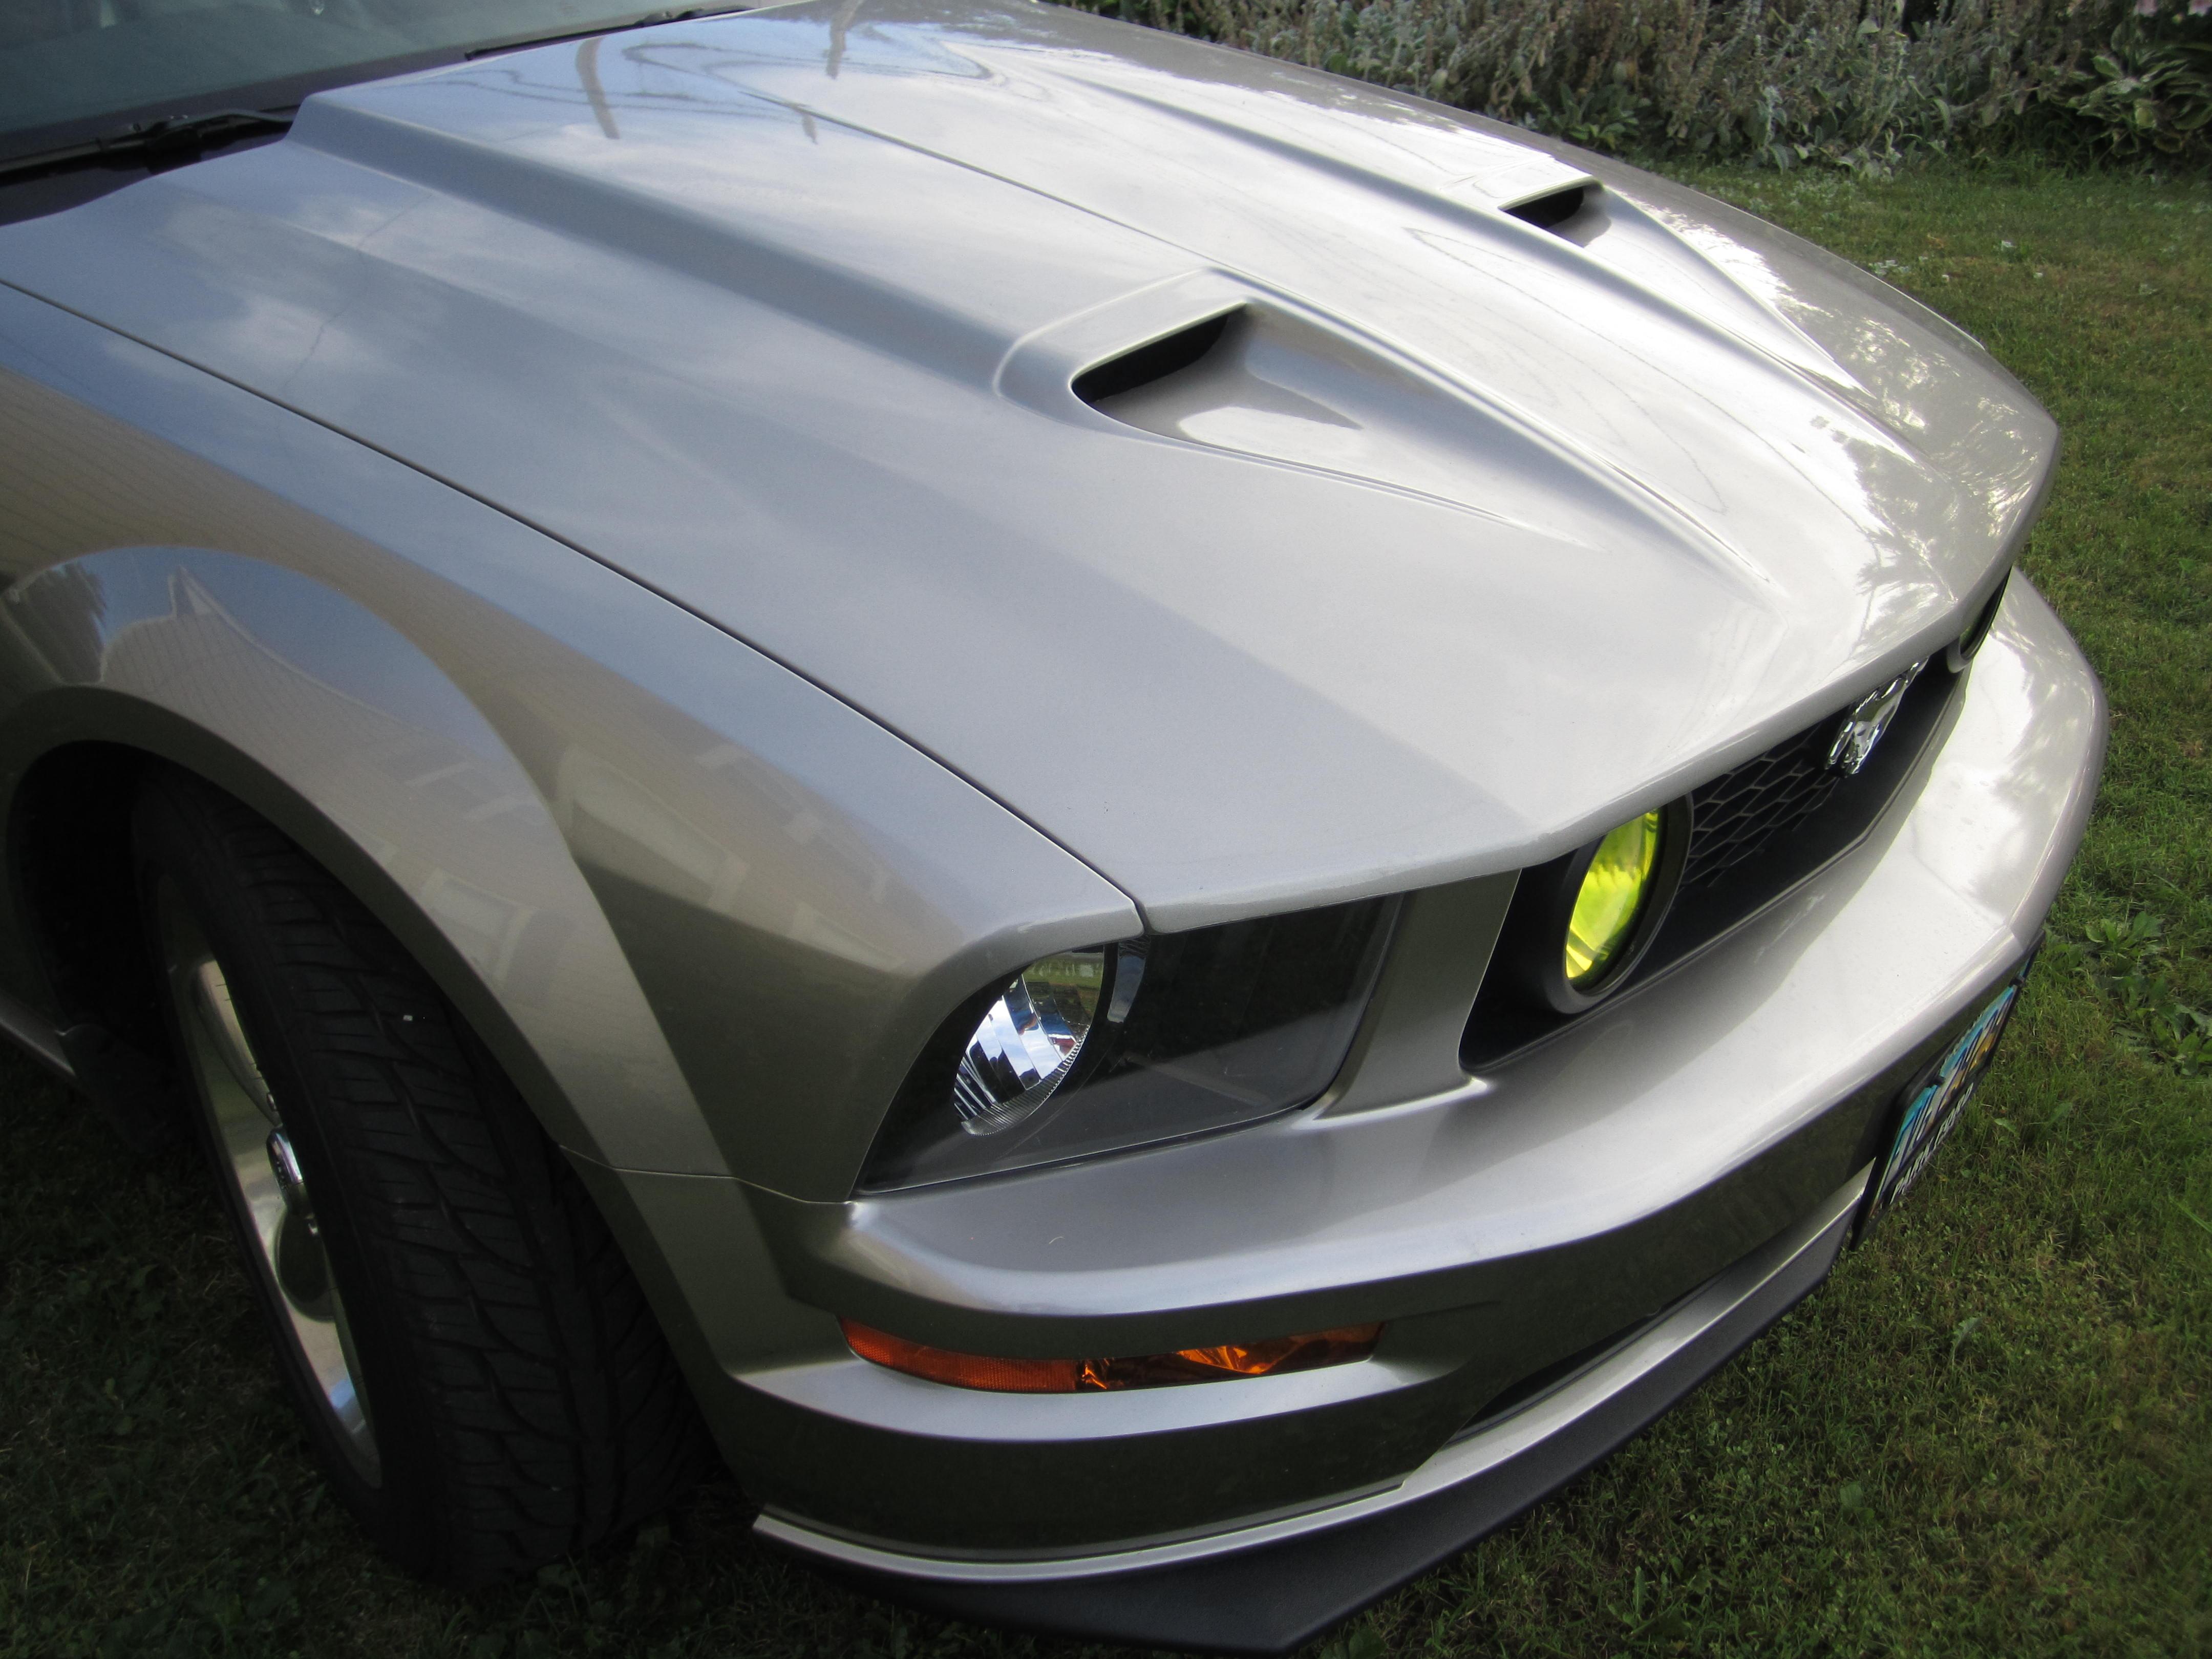 05-09 Mustang Mach One Ram Air Hood - Cervini's Auto Designs